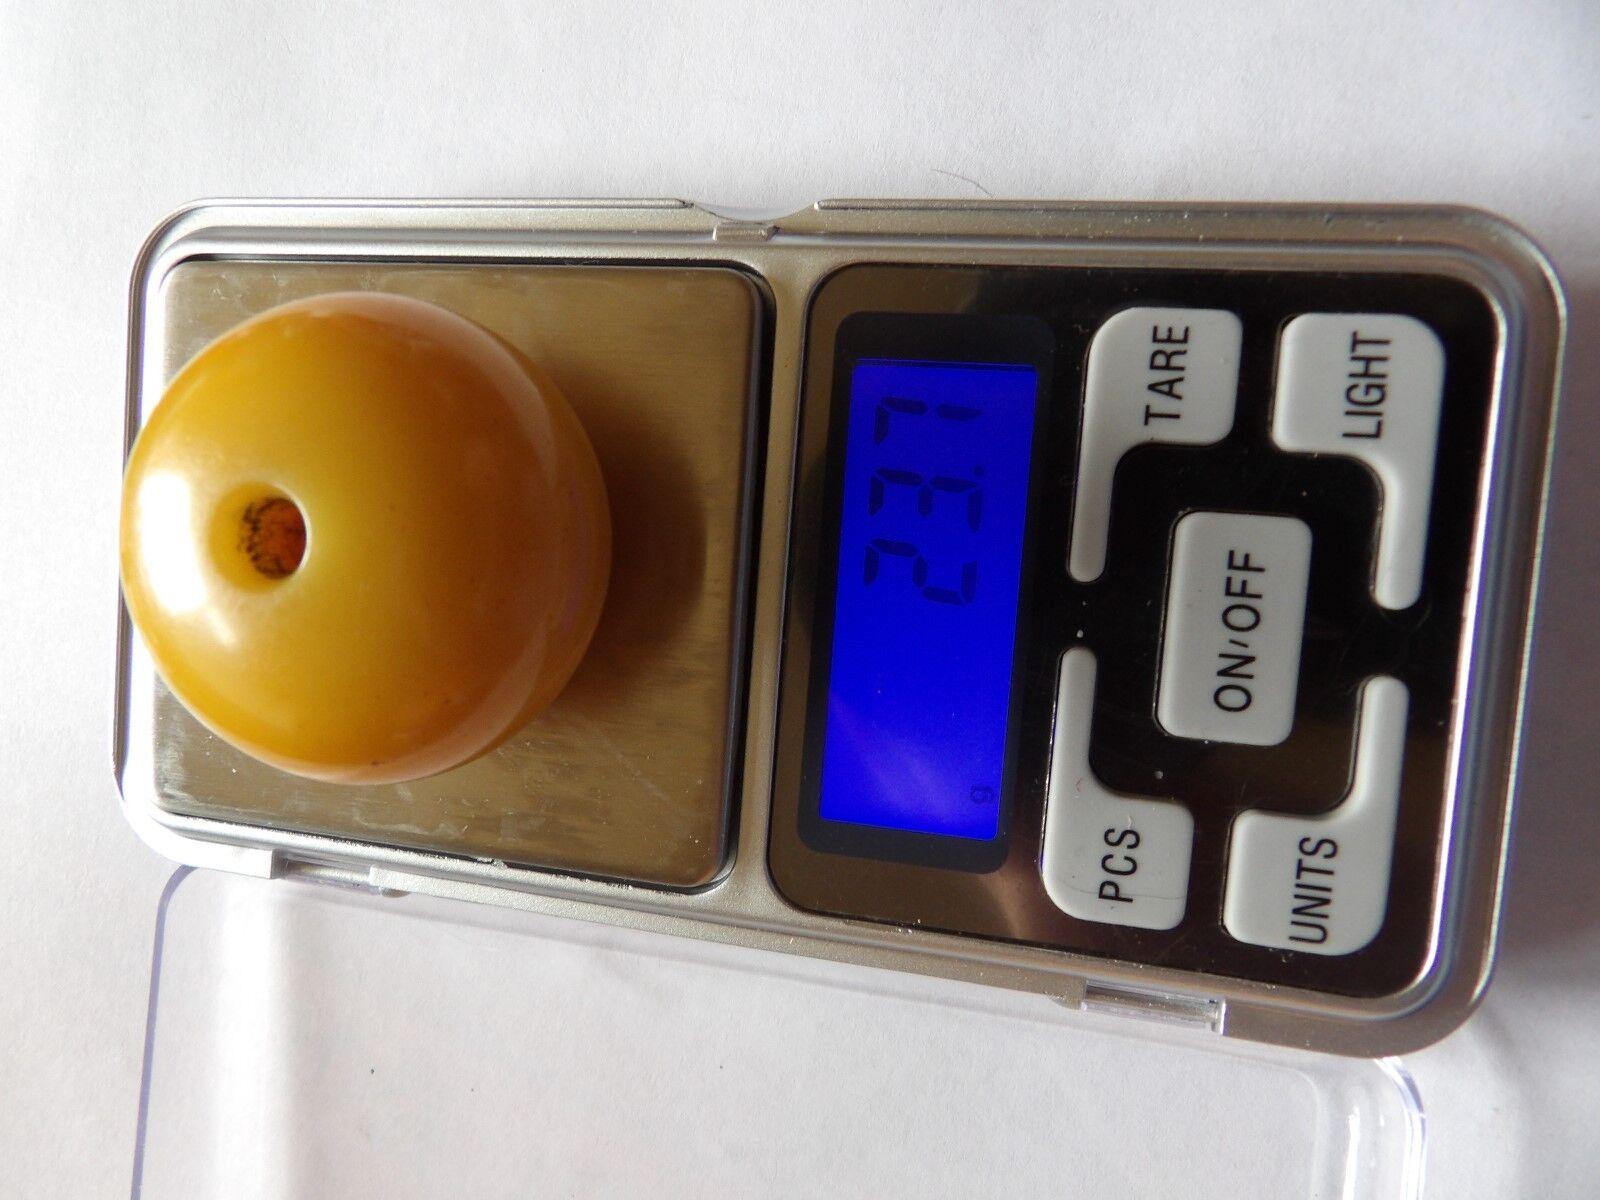 Genuine ART DECO enorme Simichrome testato eggyolk GIALLO IN IN IN BACHELITE Perline XWL347-1 f0b449